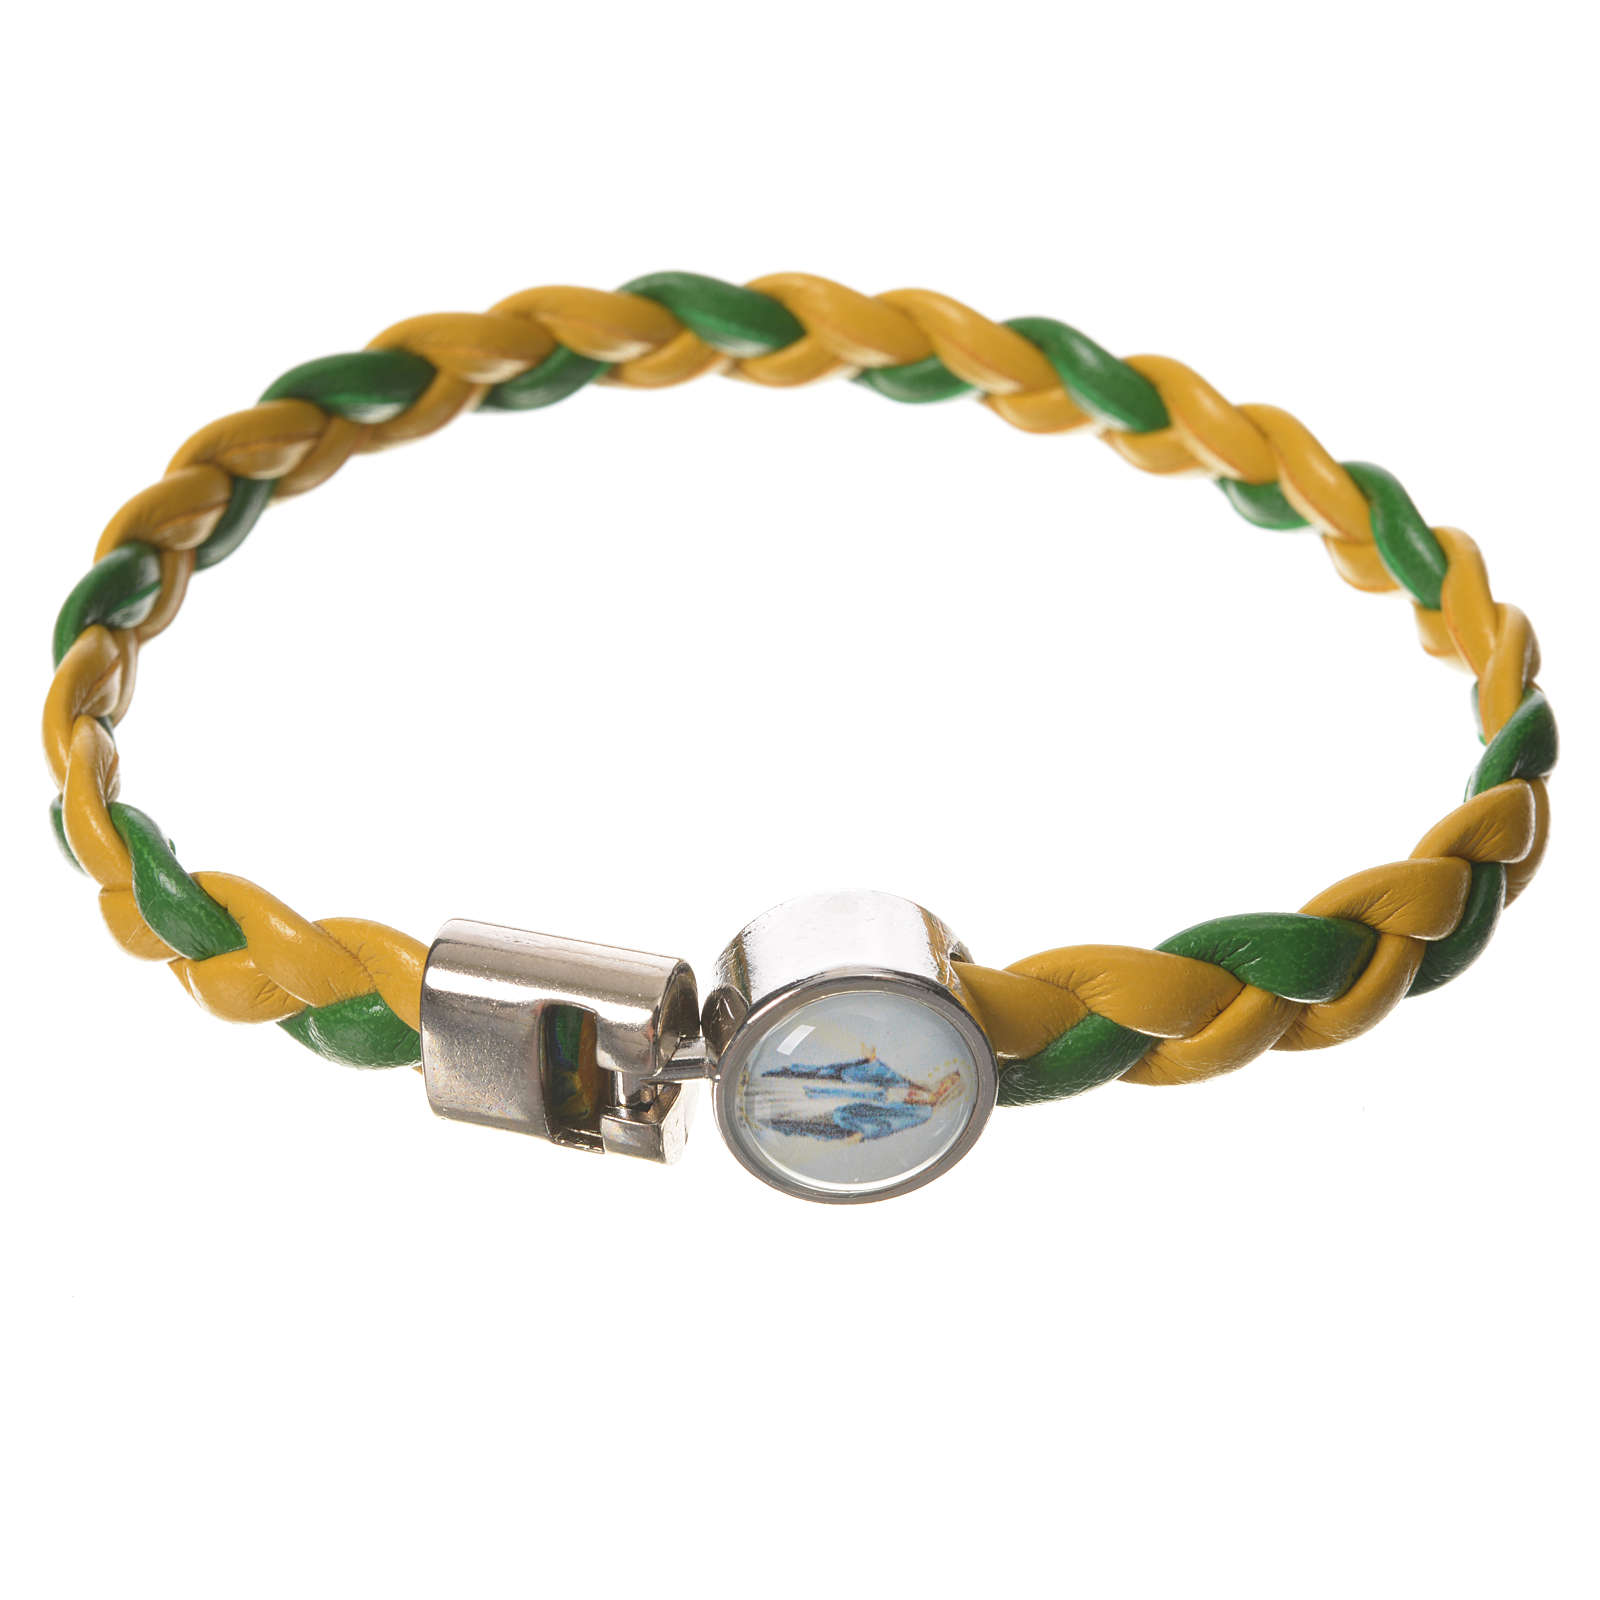 Bracelet tressé 20 cm Vierge Miraculeuse jaune/vert 4